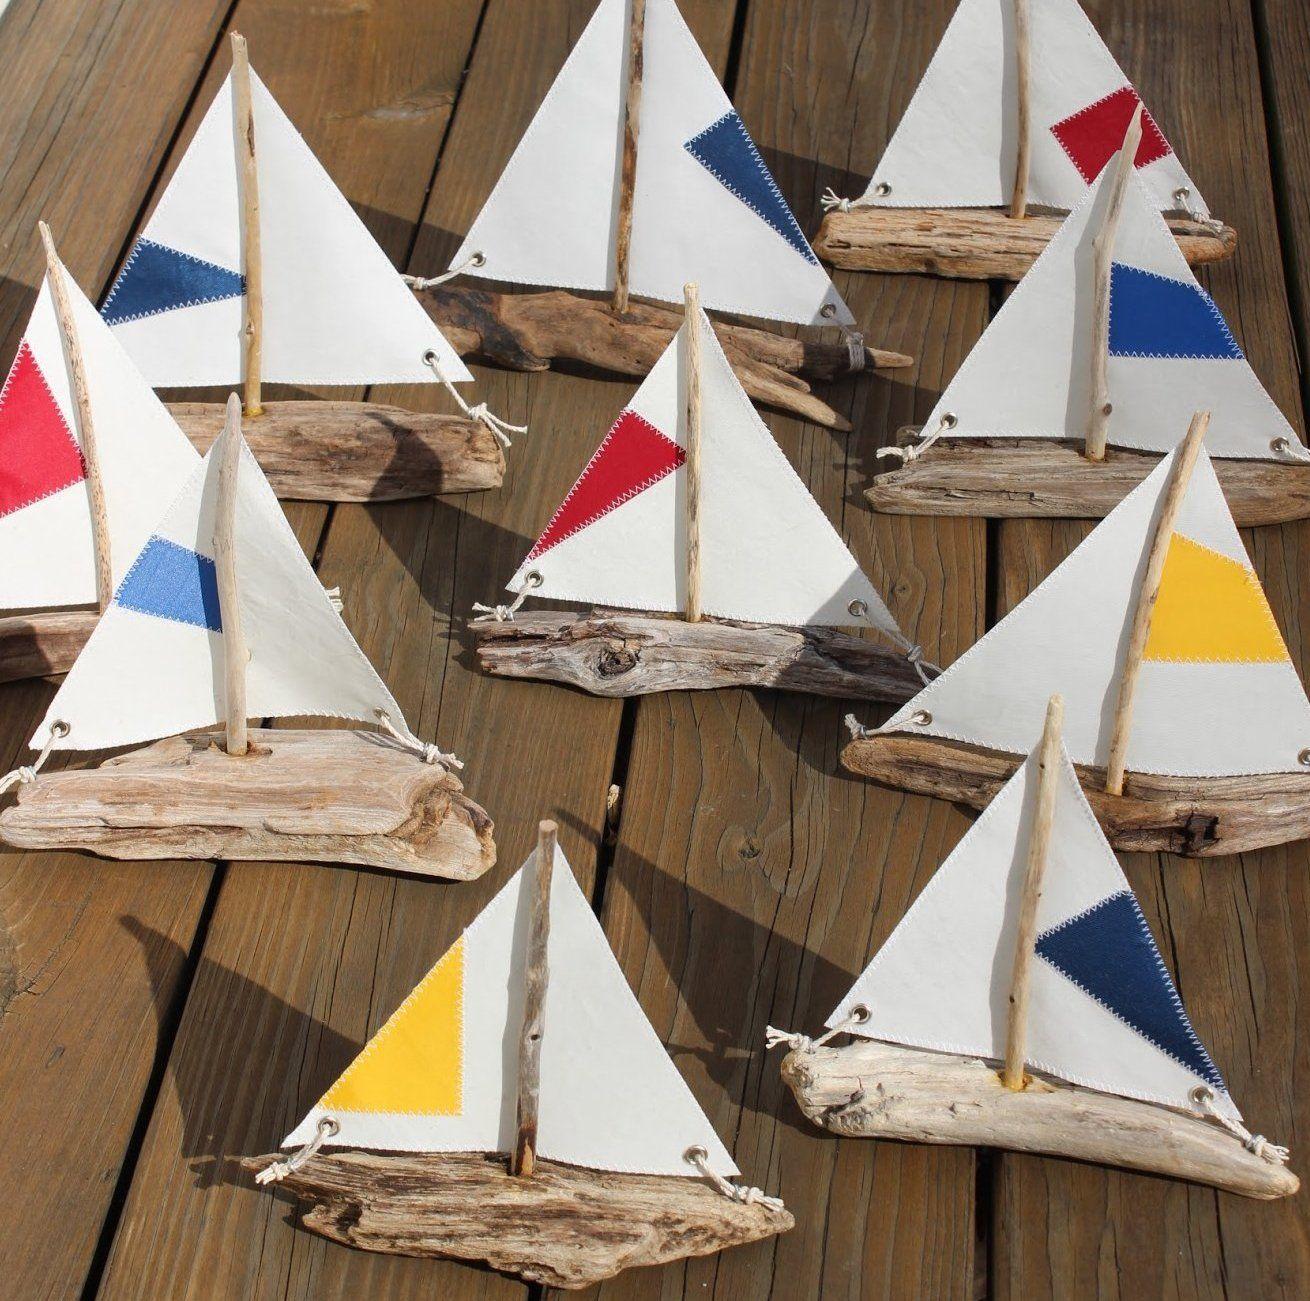 Driftwood Sailboat Ornaments By Ruth Mcgovern